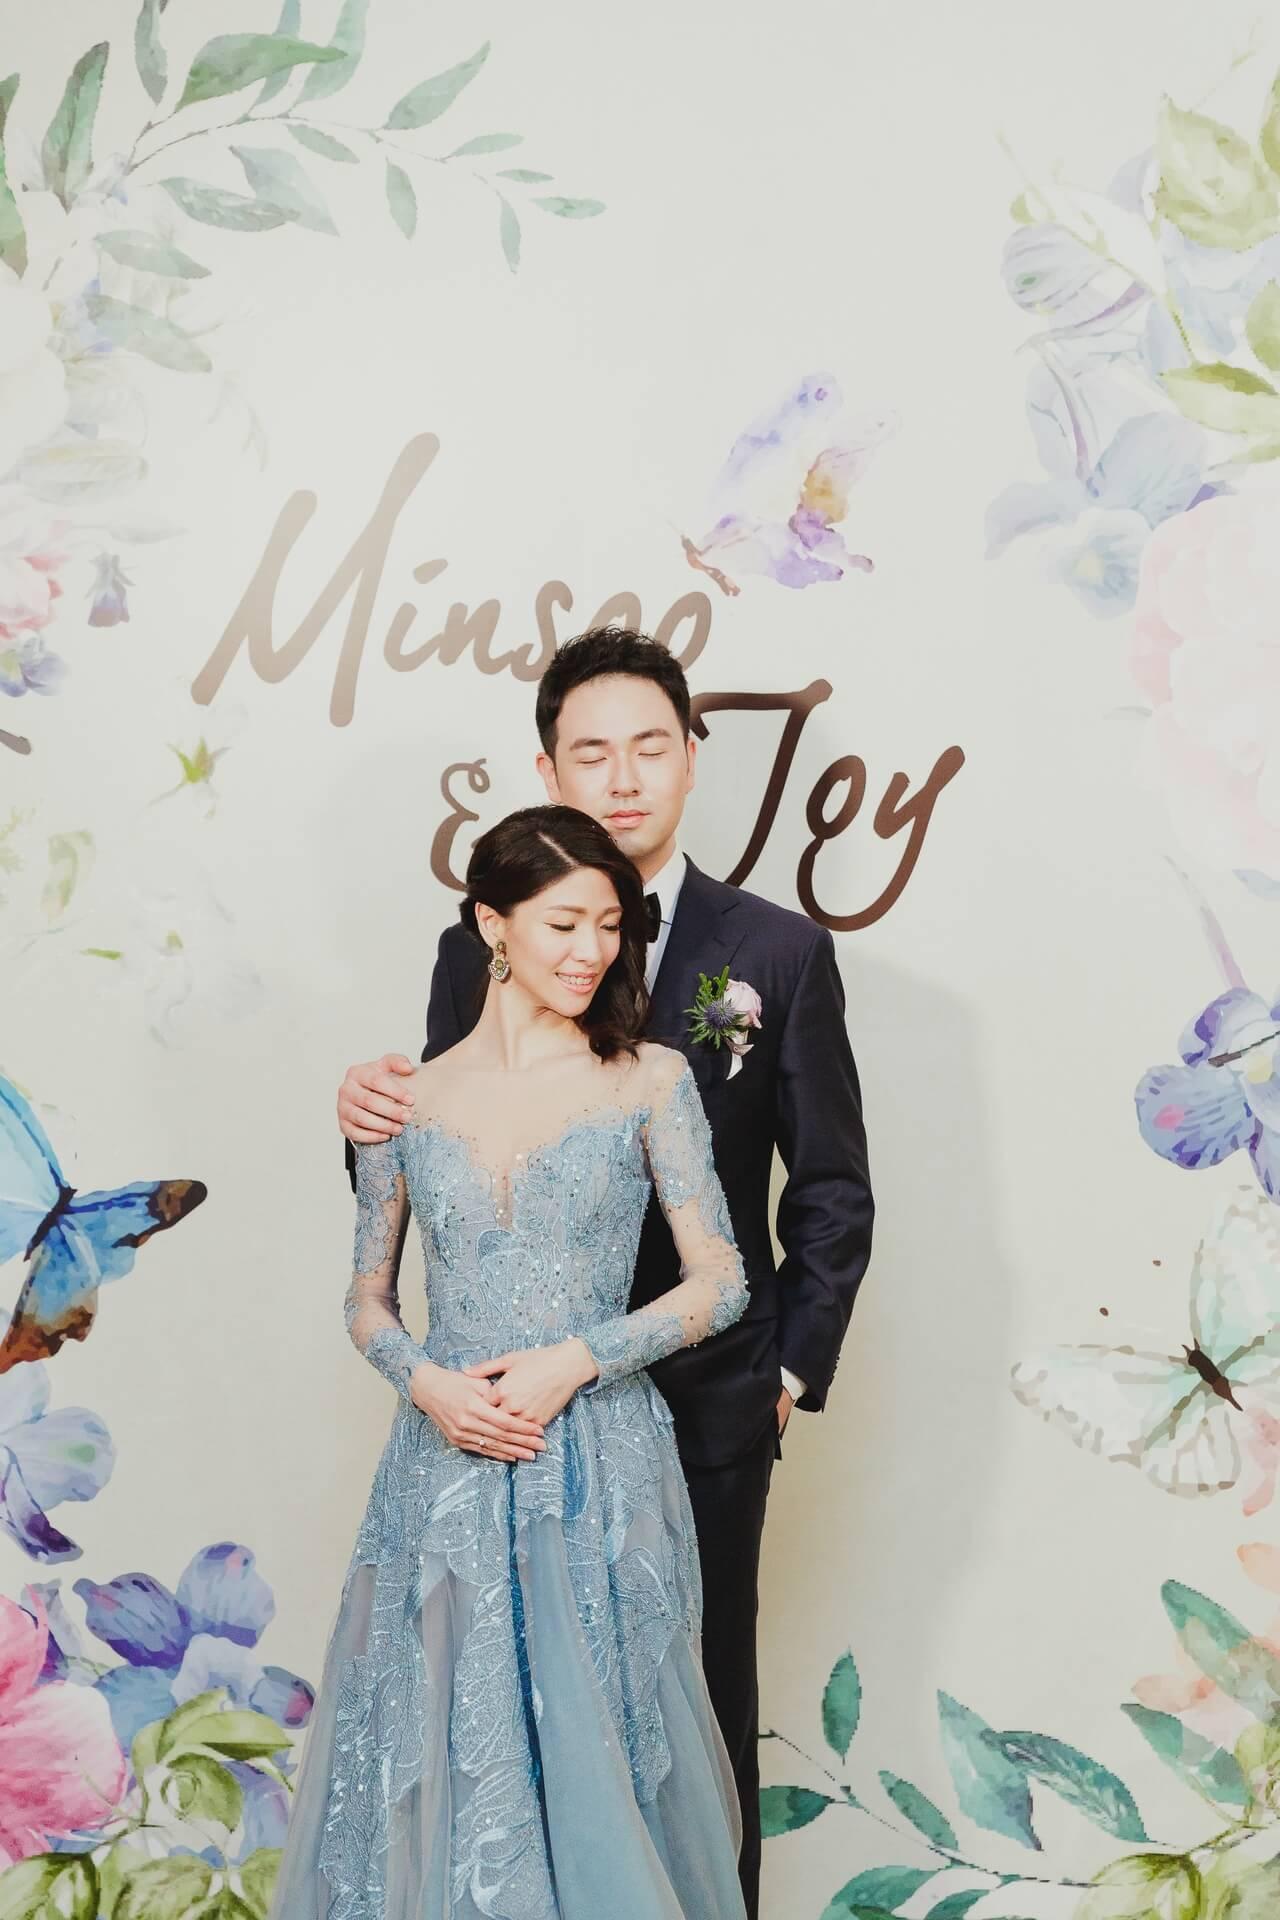 misslala 婚禮紀錄 婚禮紀實 韓國婚禮 萬豪婚禮 萬豪儀式 推薦婚攝 底片風格 電影風格 -0079.jpg